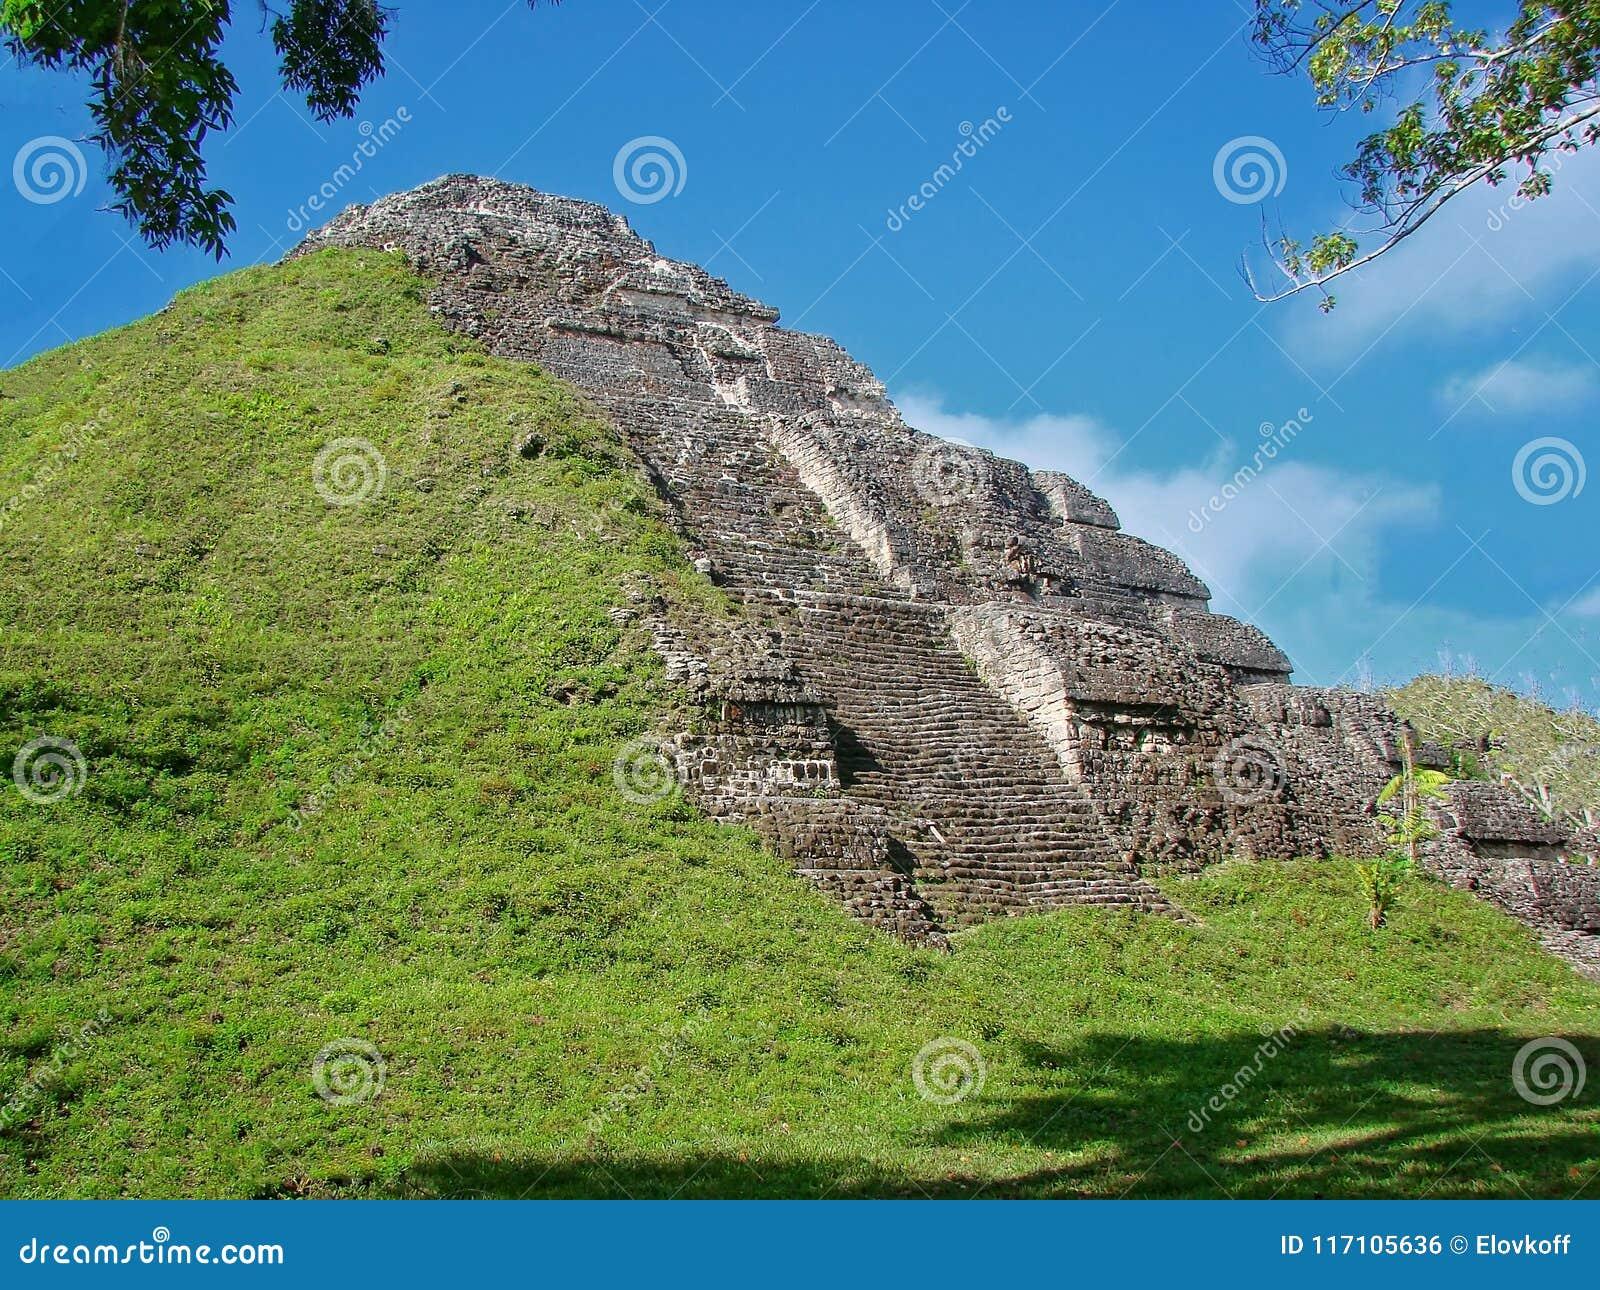 Tikal Pyramids, Guatemala